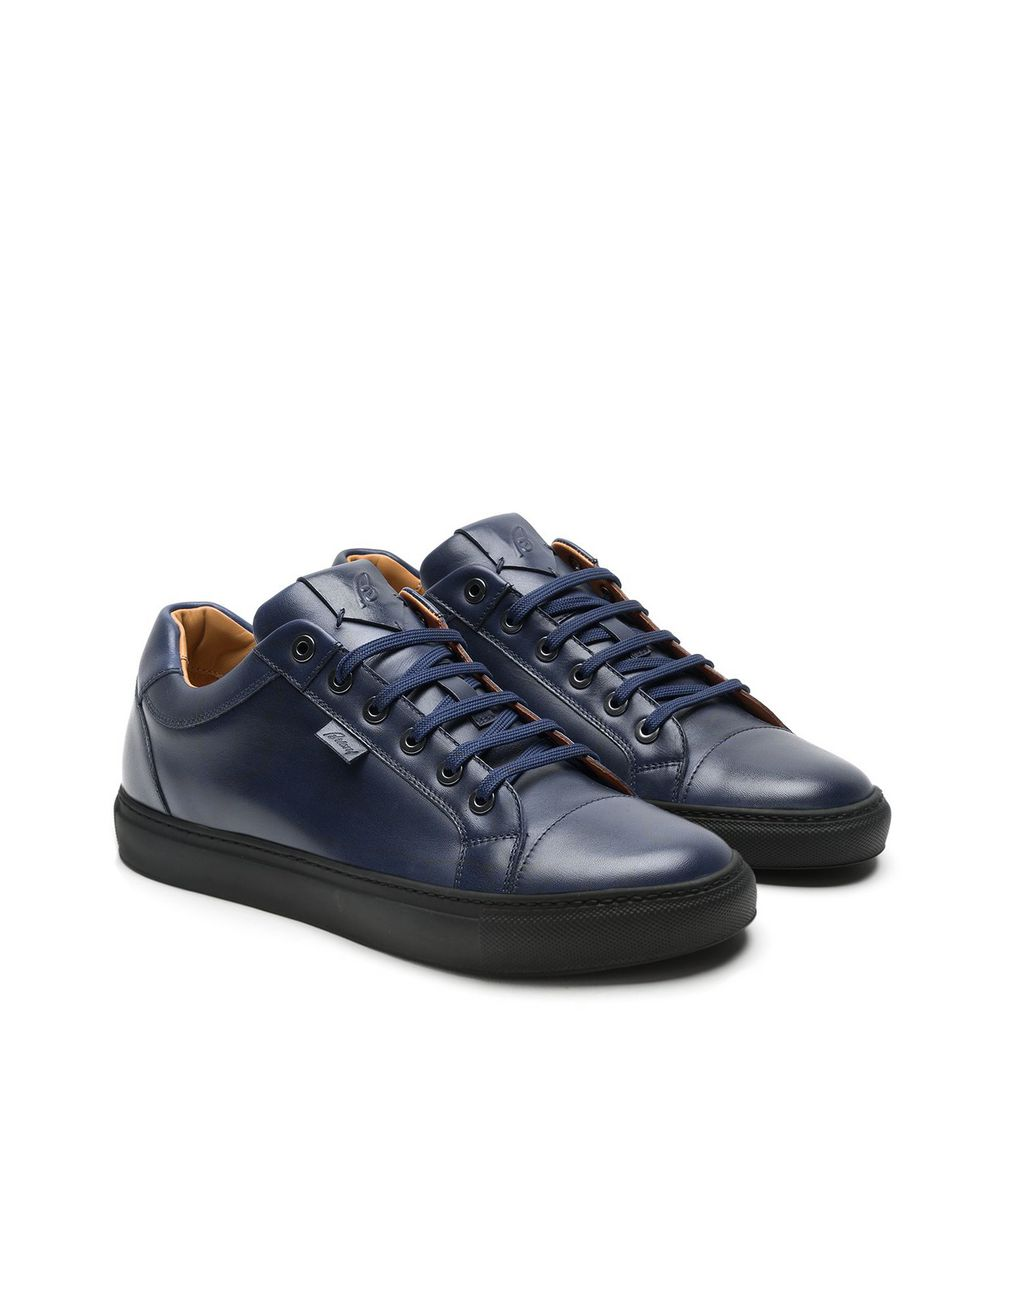 BRIONI Navy Blue Calfskin Sneaker Sneakers [*** pickupInStoreShippingNotGuaranteed_info ***] d